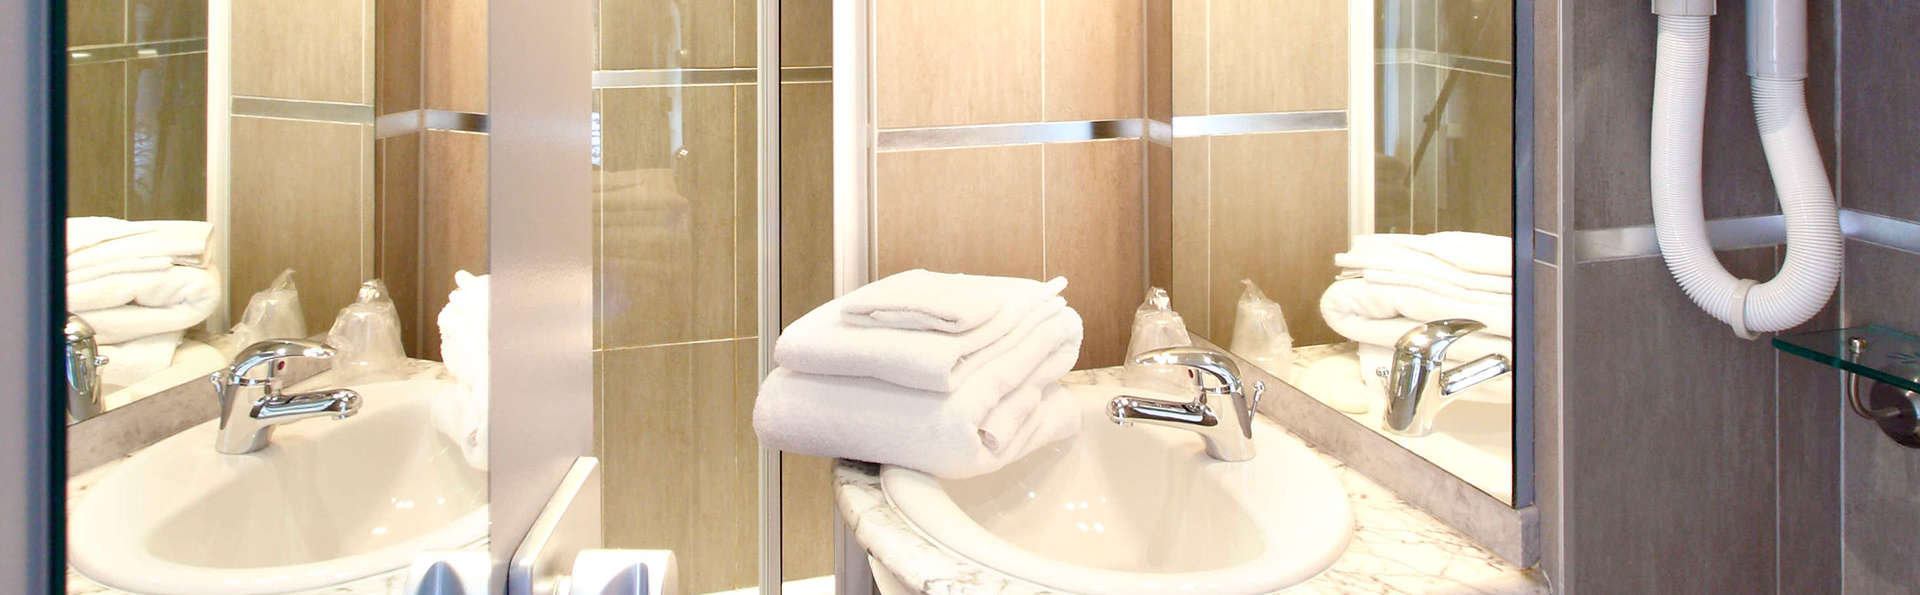 Hôtel Château Corneille - EDIT_bathroom222.jpg